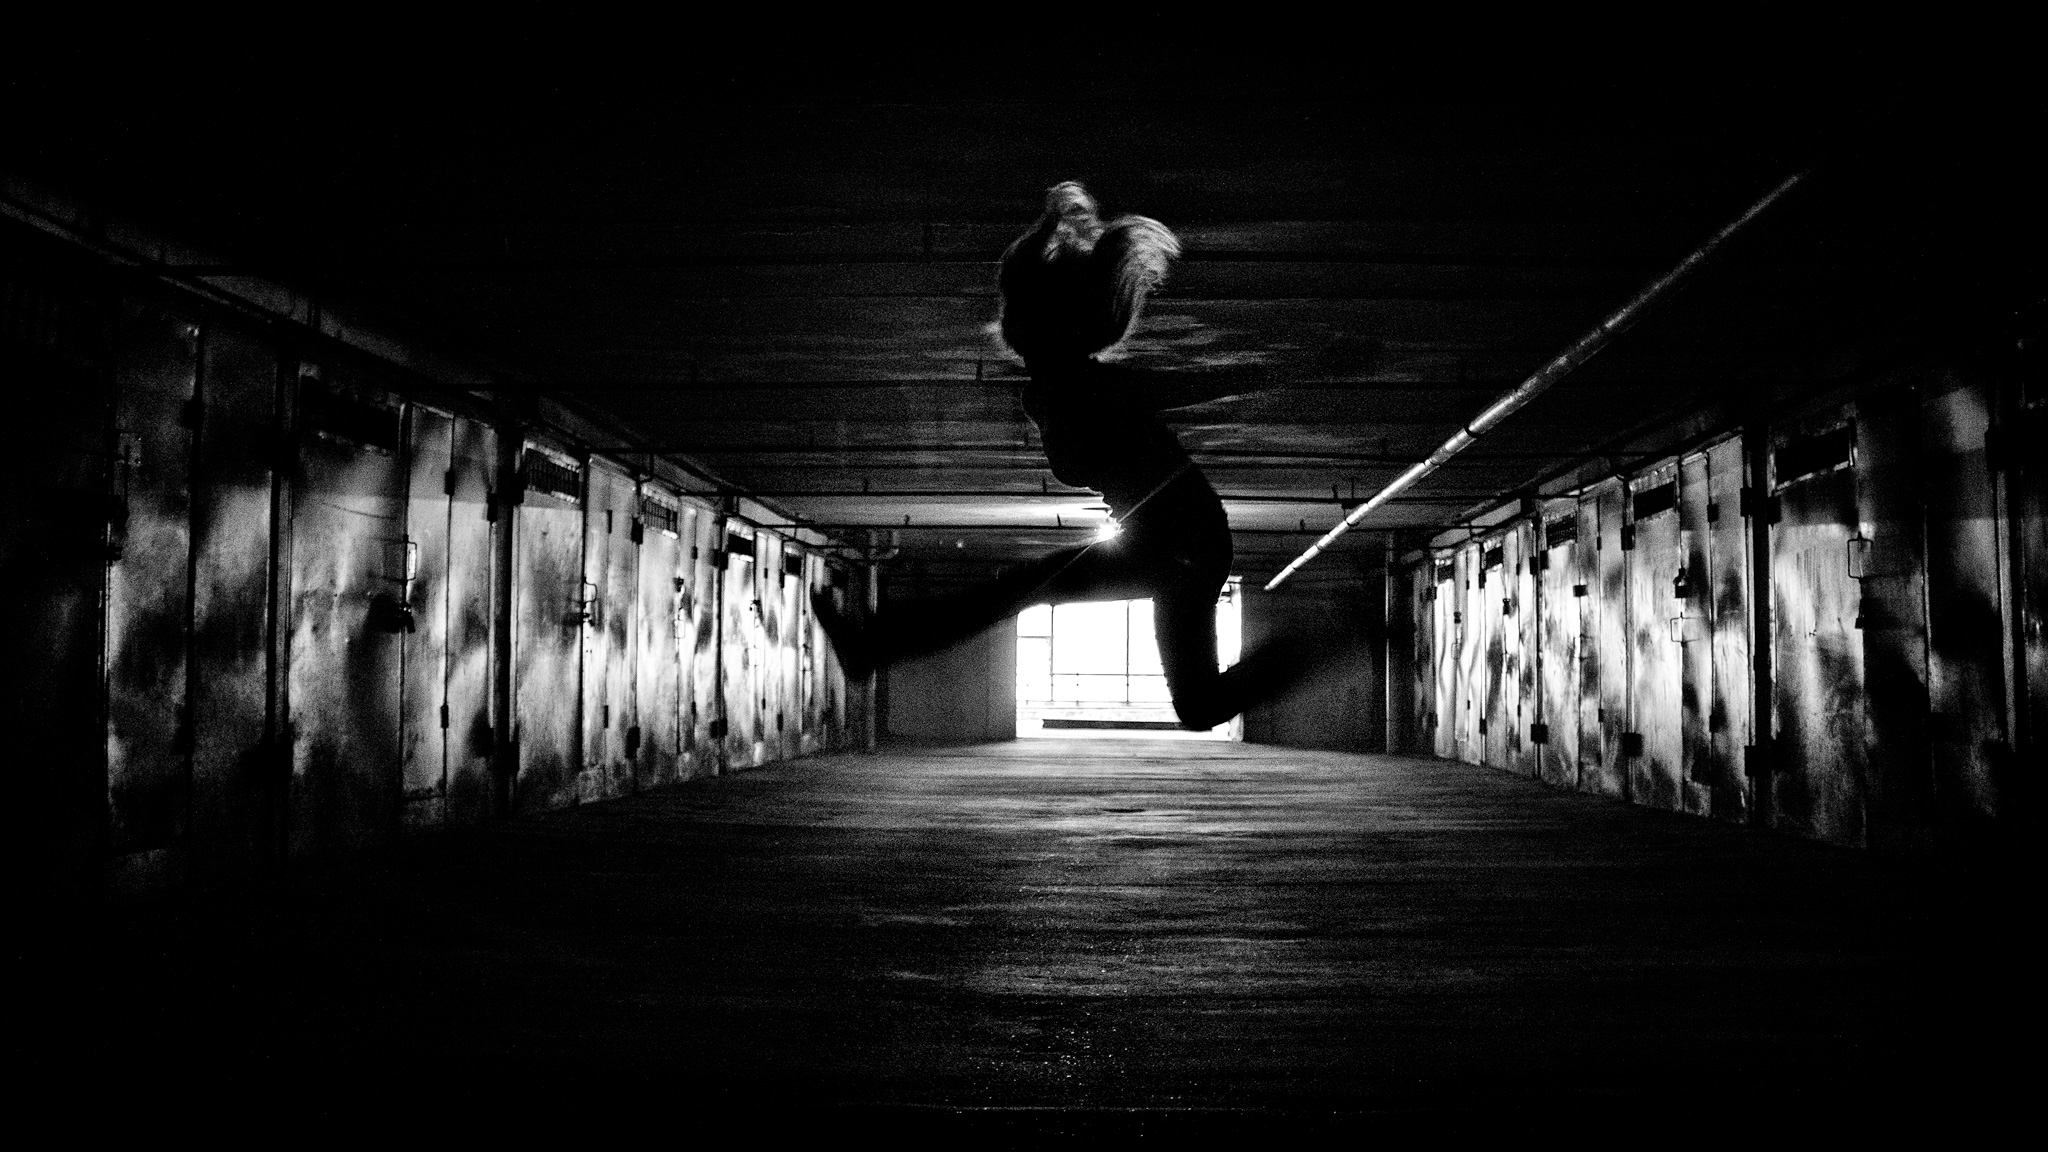 Spooky noir jumping silhouette